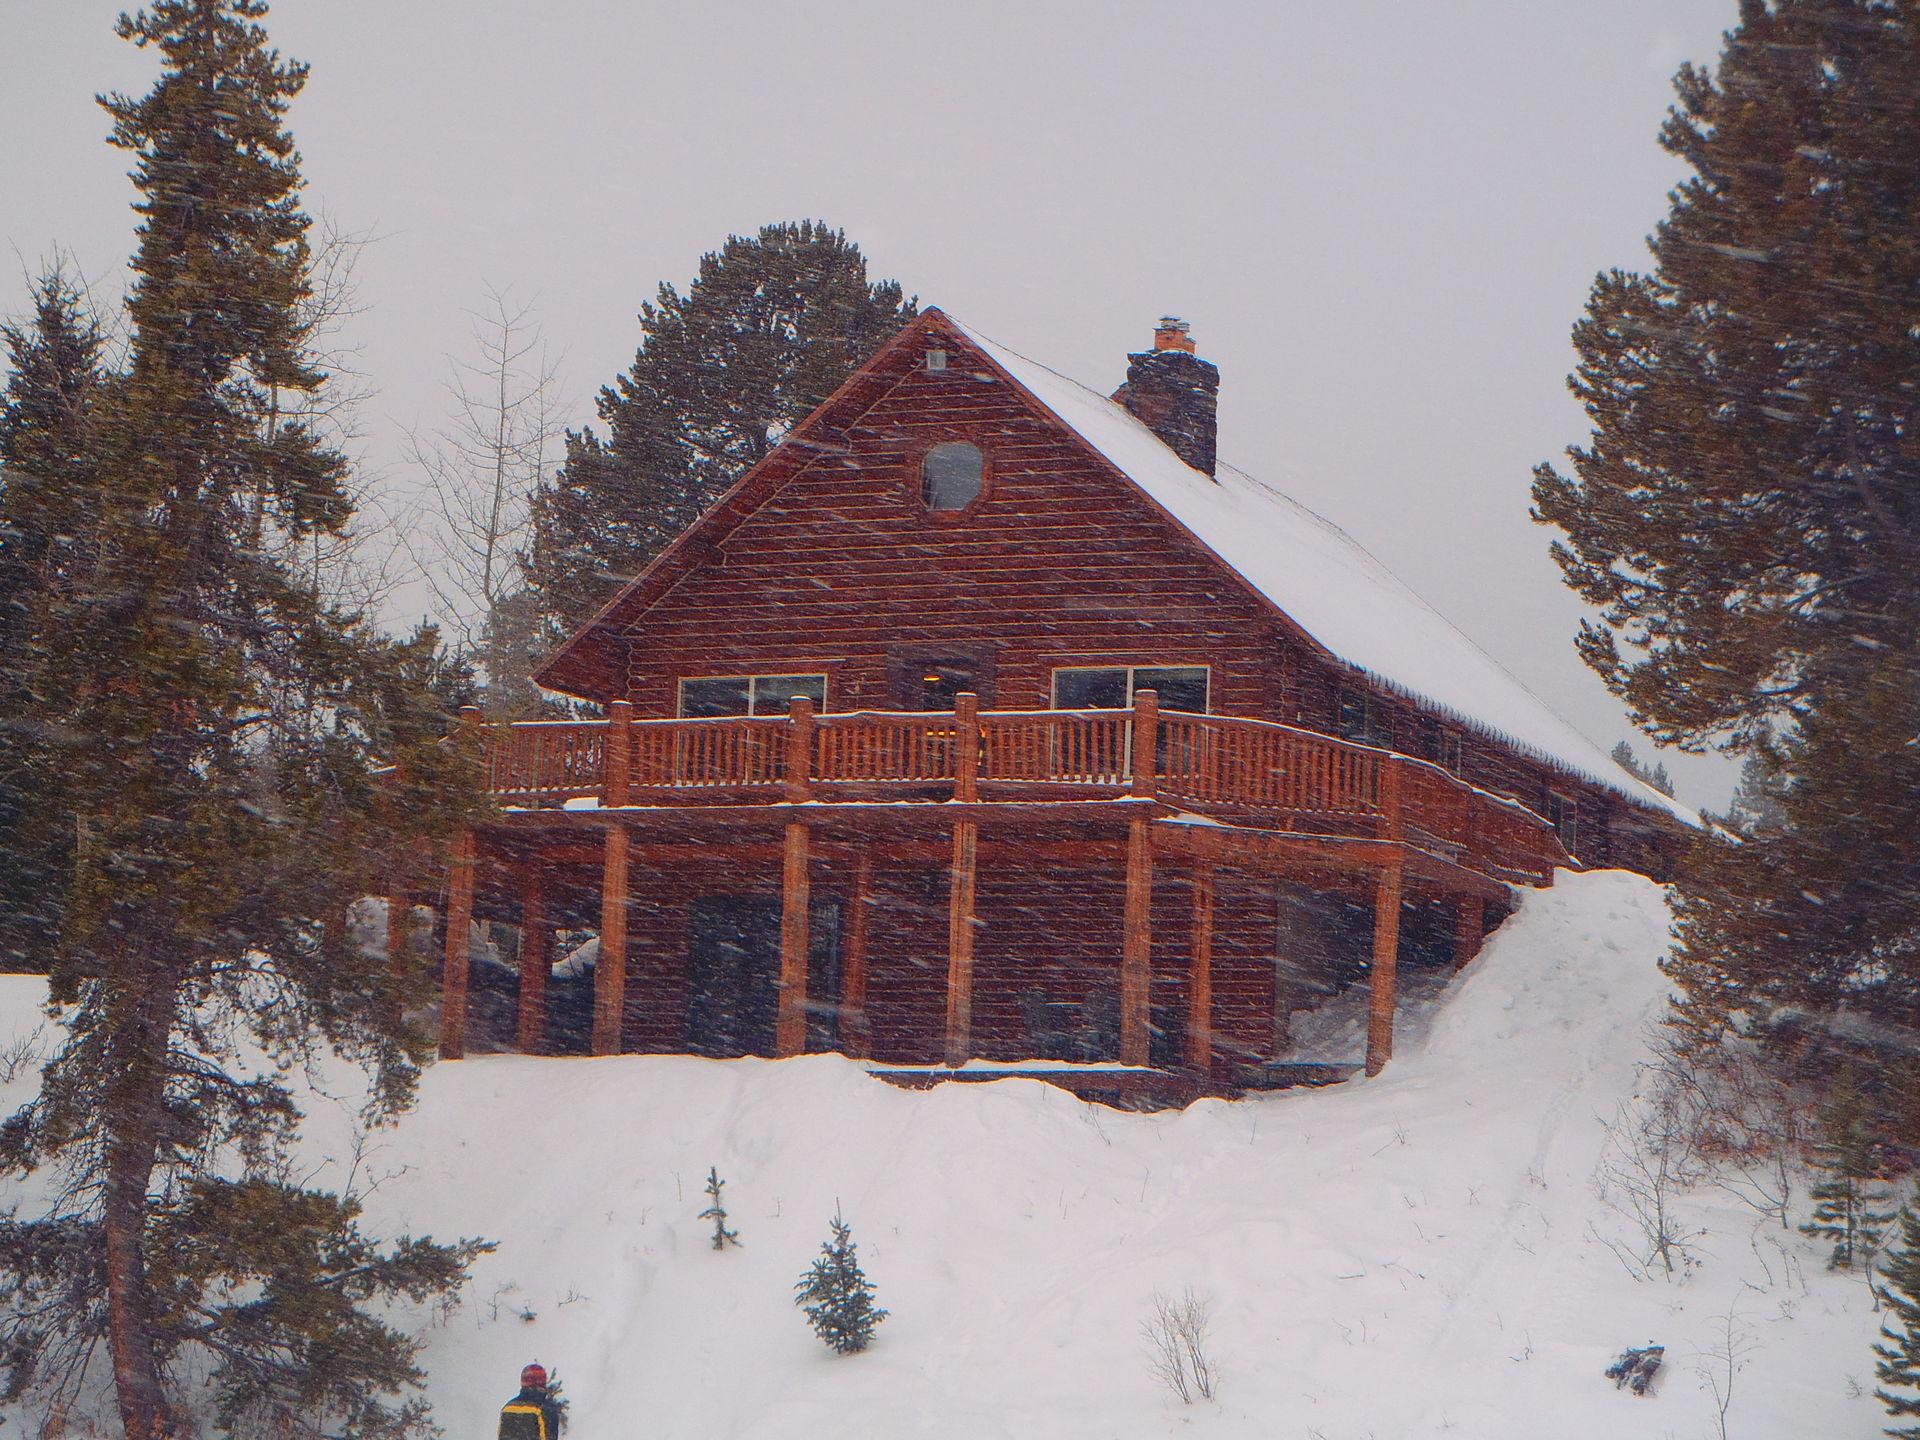 geyser national island lake lodge faithful lodgings rentals old park inn yellowstone cabins cabin idaho exterior lodges